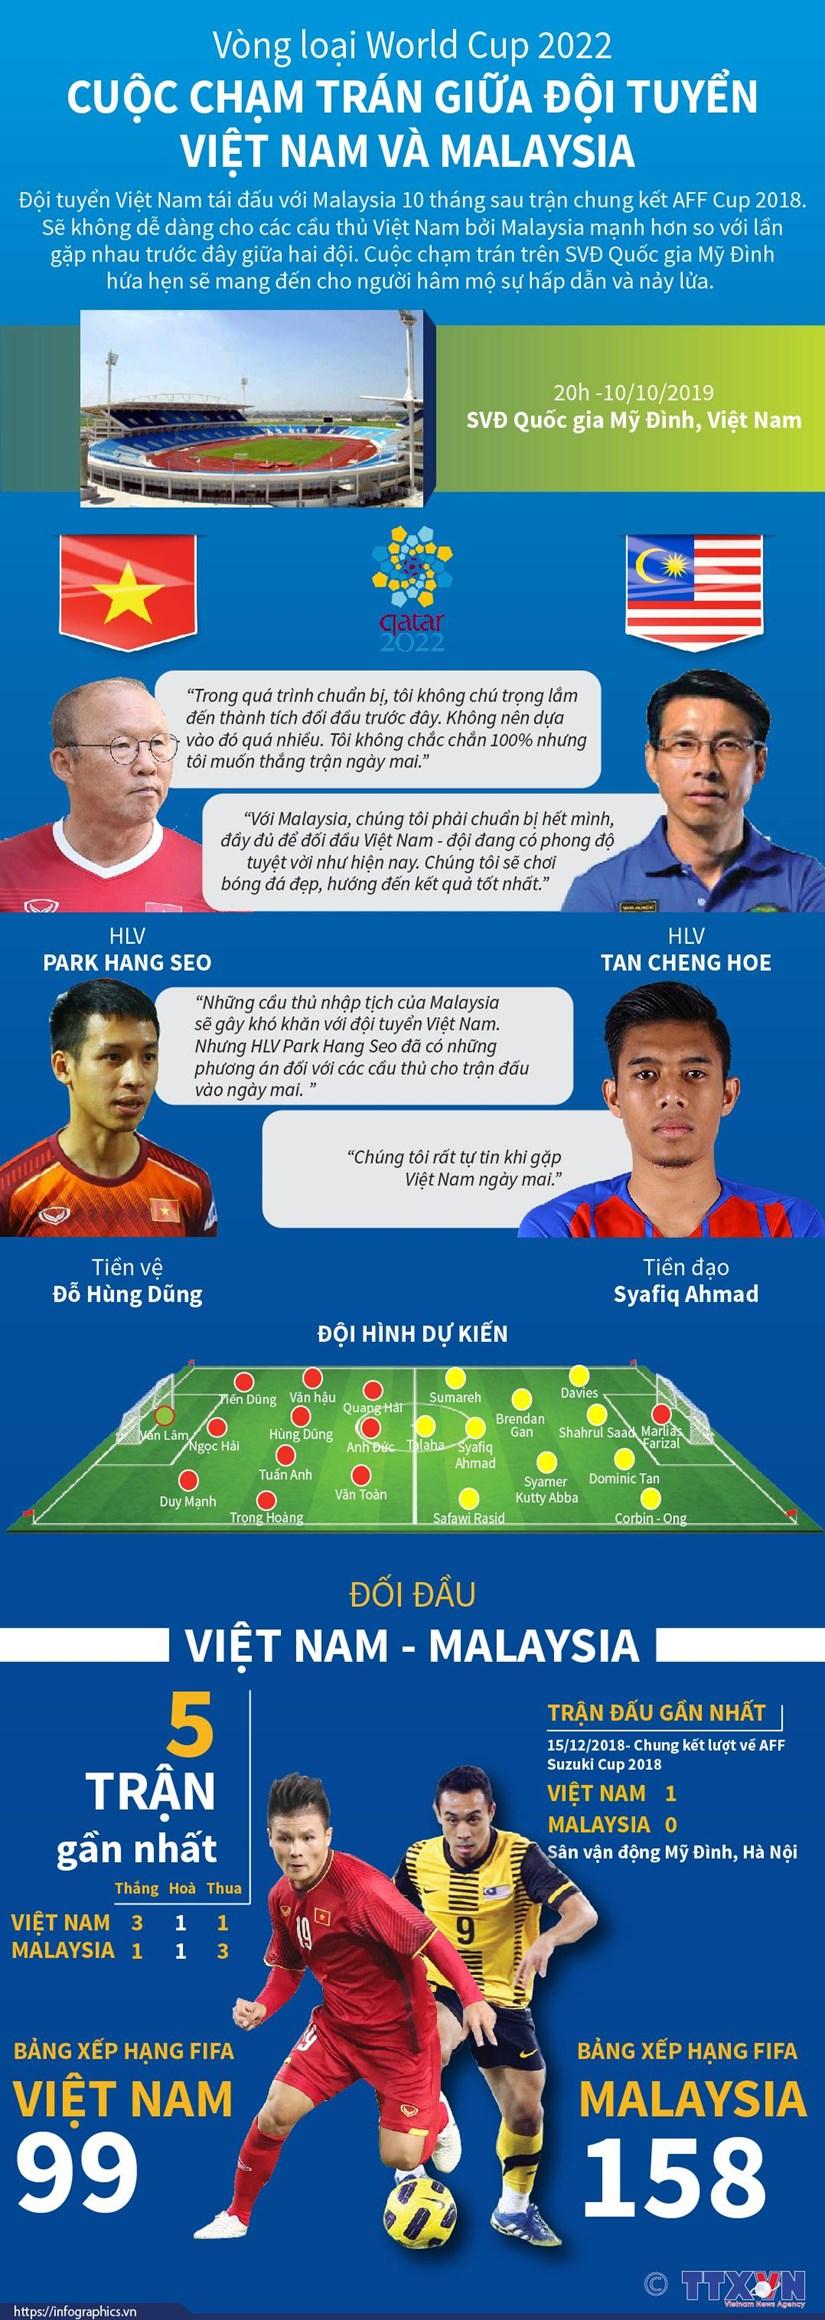 [Infographics] Cuoc cham tran giua doi tuyen Viet Nam va Malaysia hinh anh 1